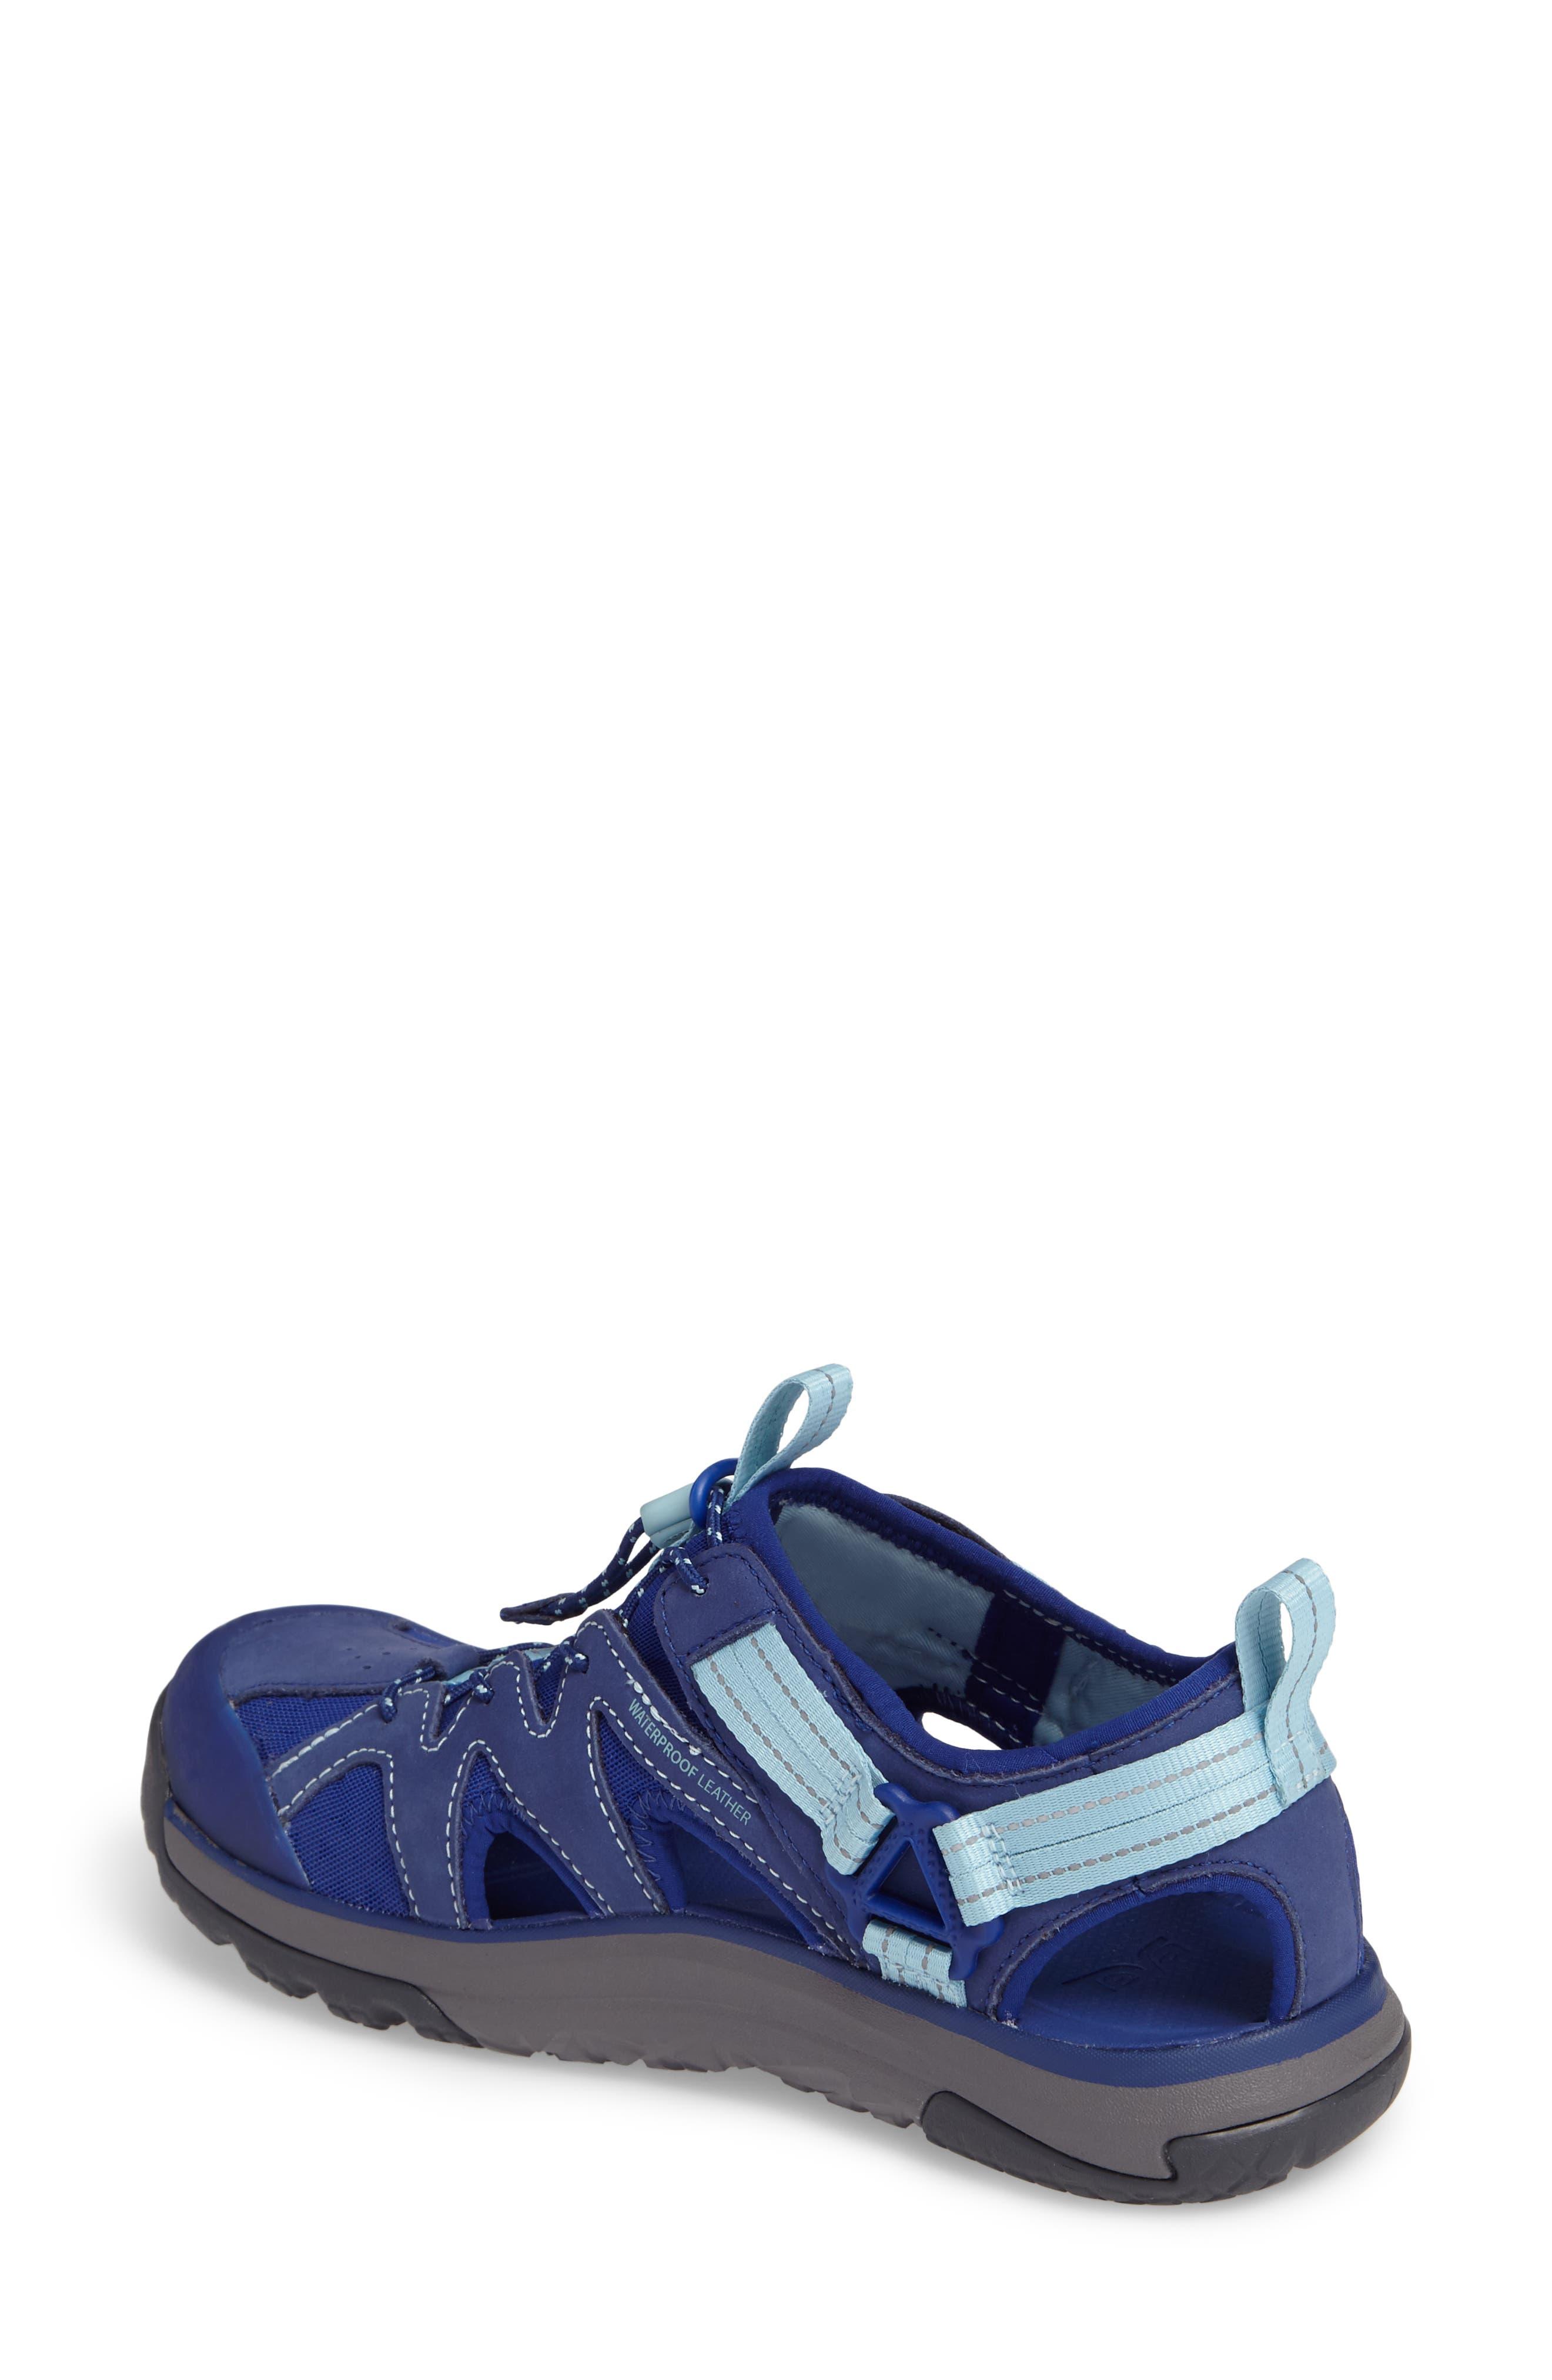 Terra Float Active Sandal,                             Alternate thumbnail 8, color,